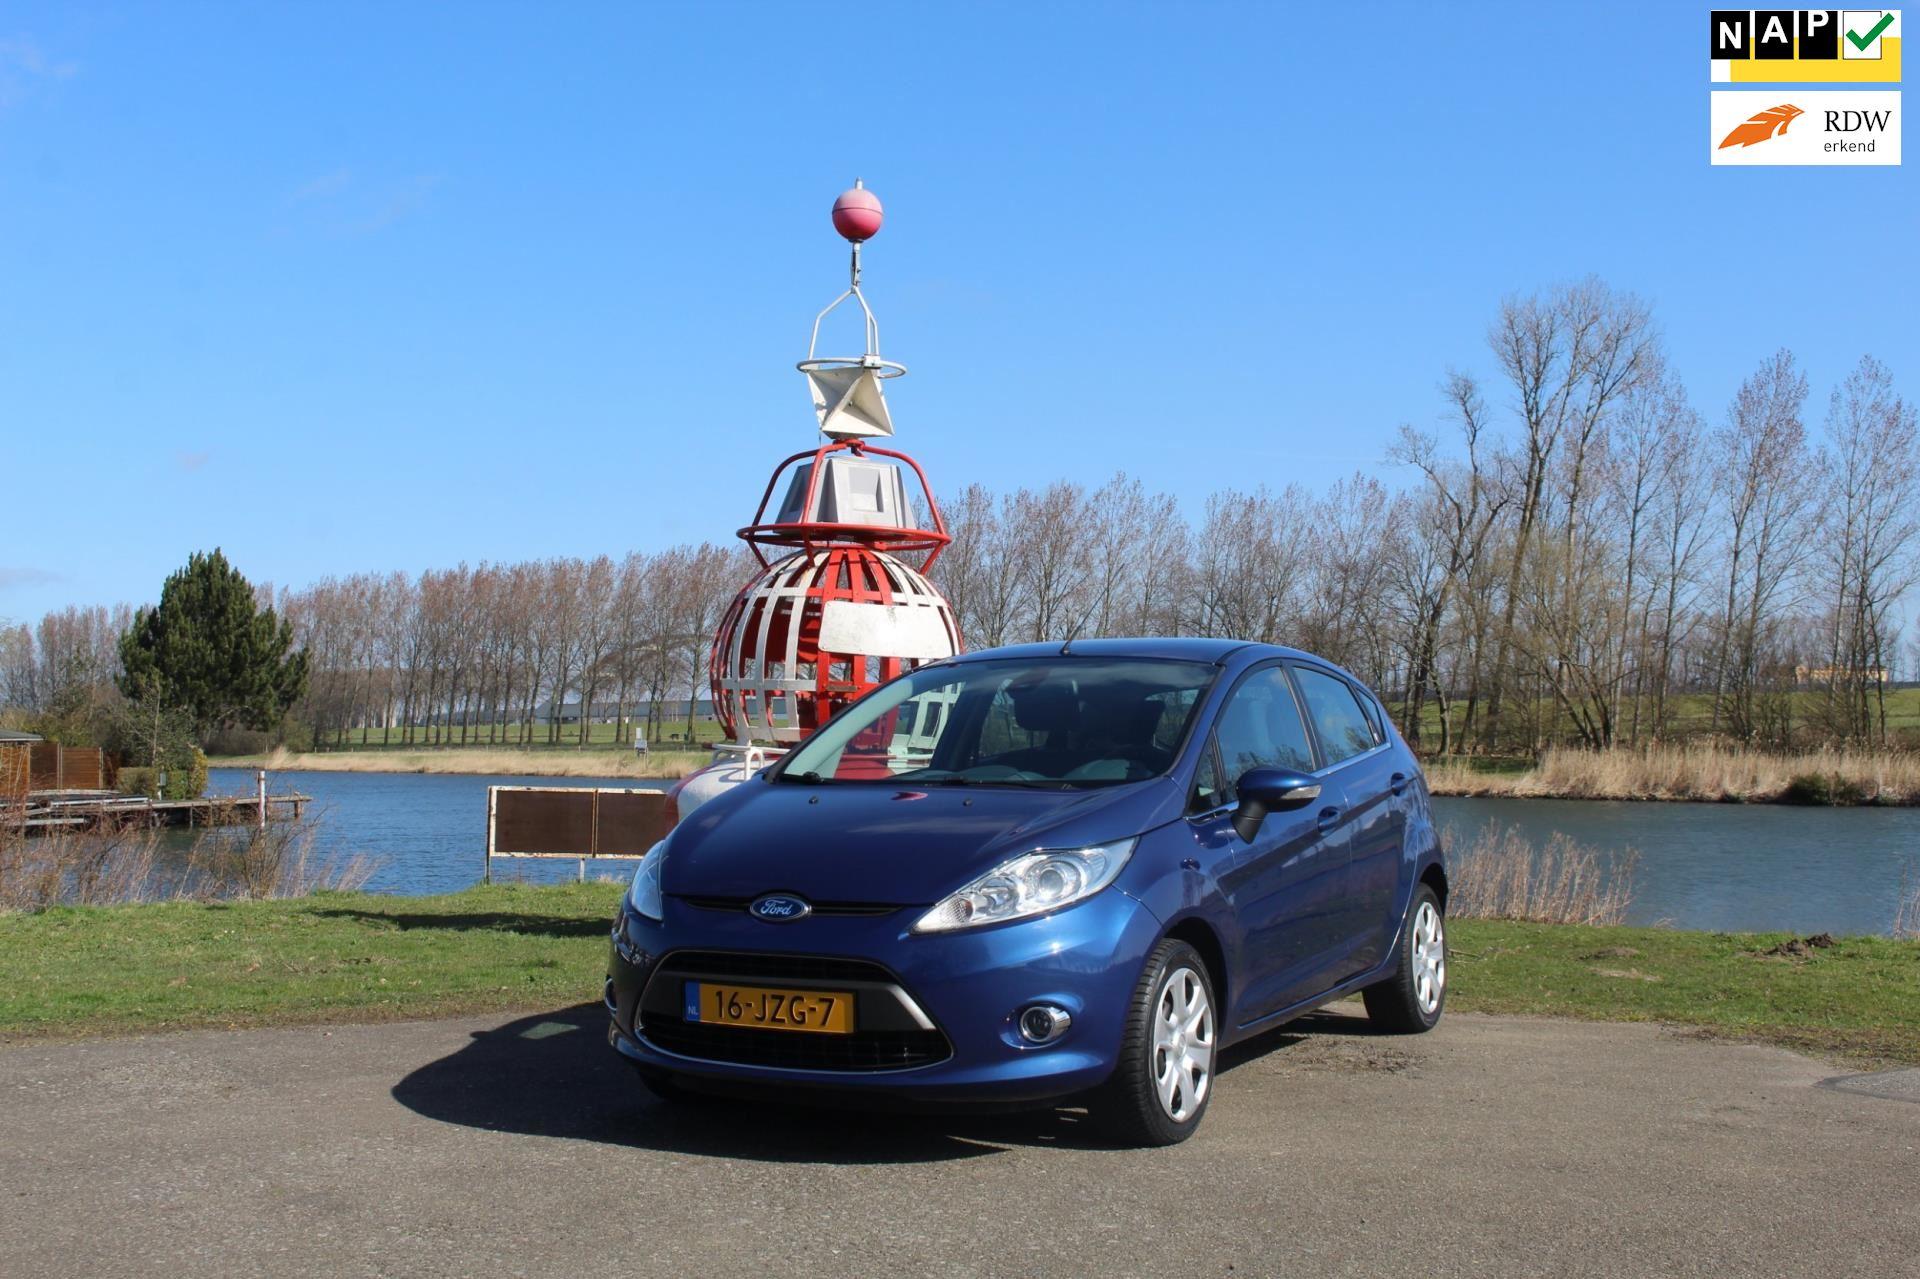 Ford Fiesta occasion - Van Vliet Auto's